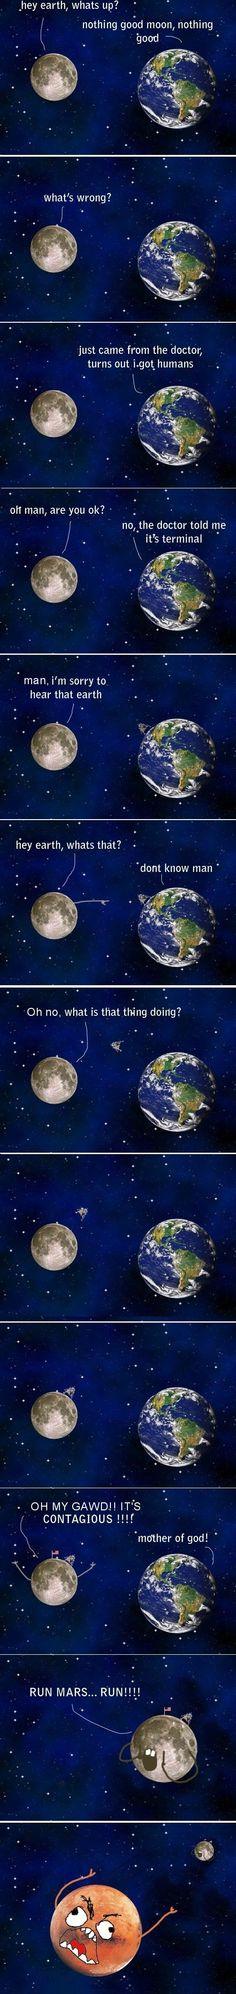 too late mars!